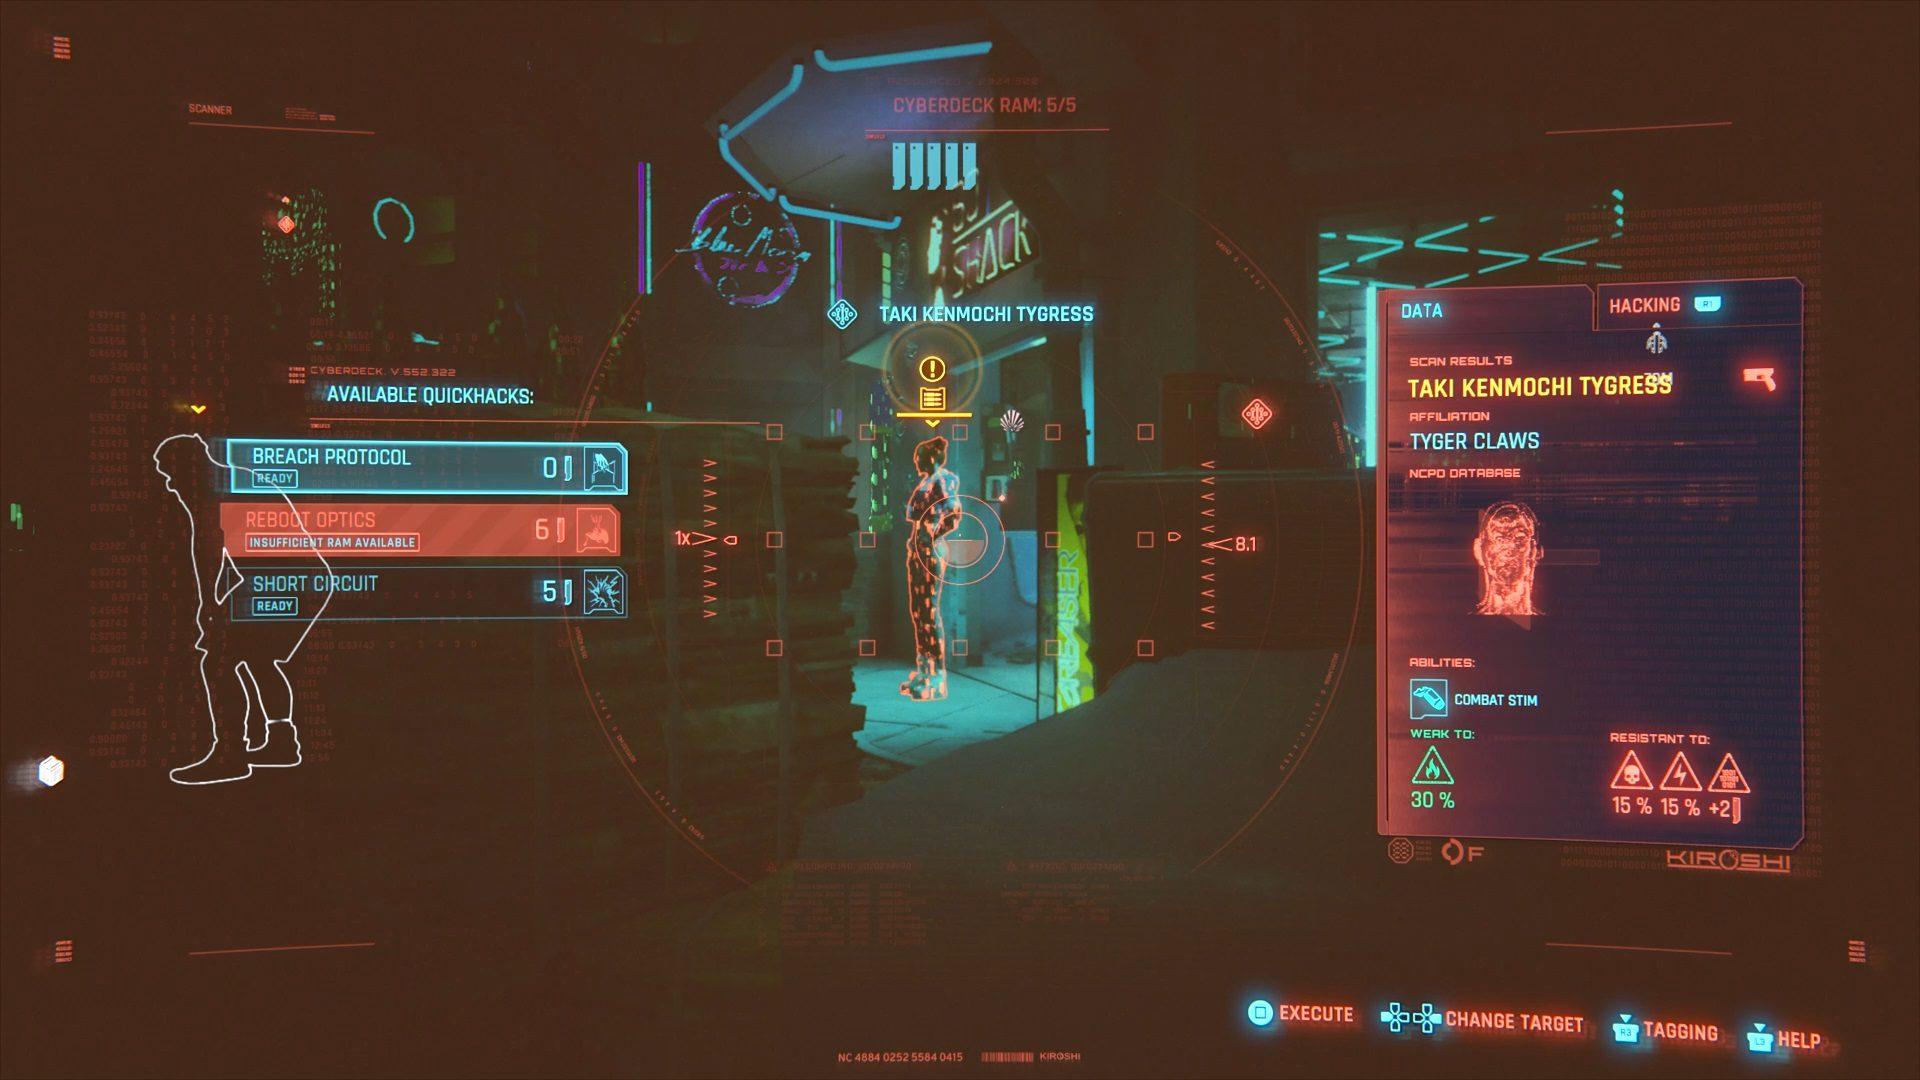 Cyberpunk 2077 Taki Kenmochi Location Guide